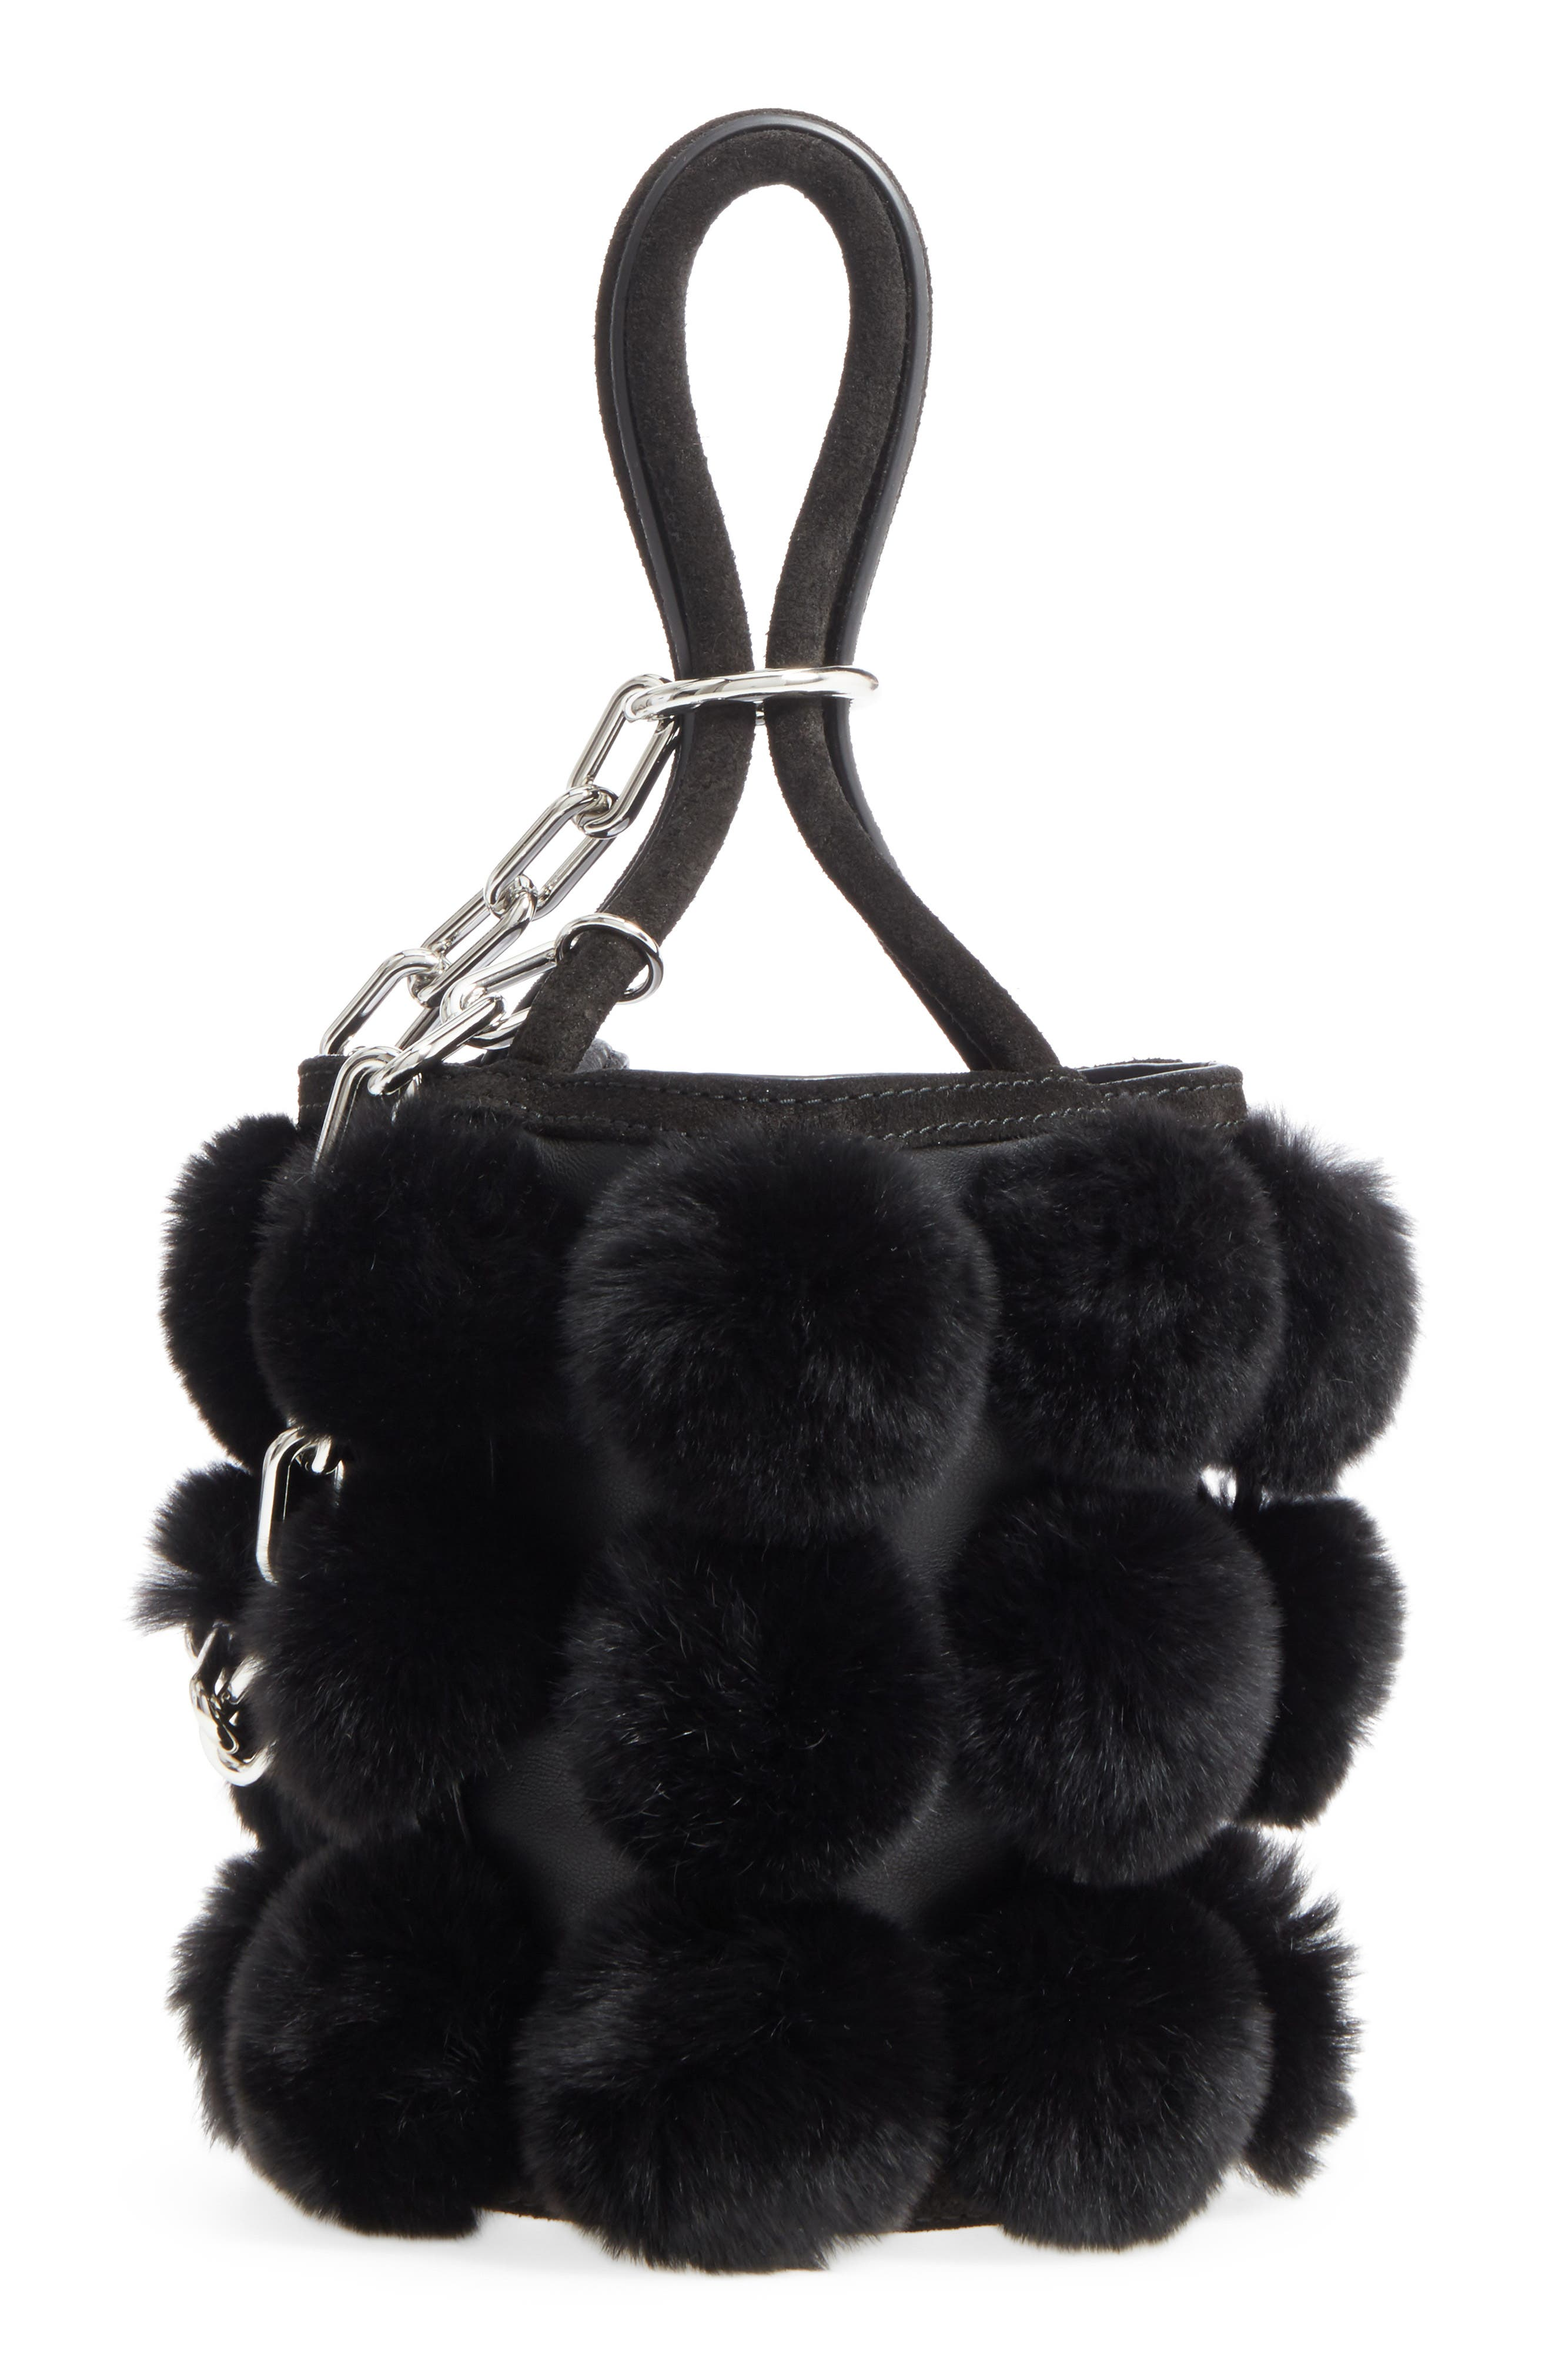 Alternate Image 1 Selected - Alexander Wang Mini Roxy Genuine Rabbit Fur Pompom Leather